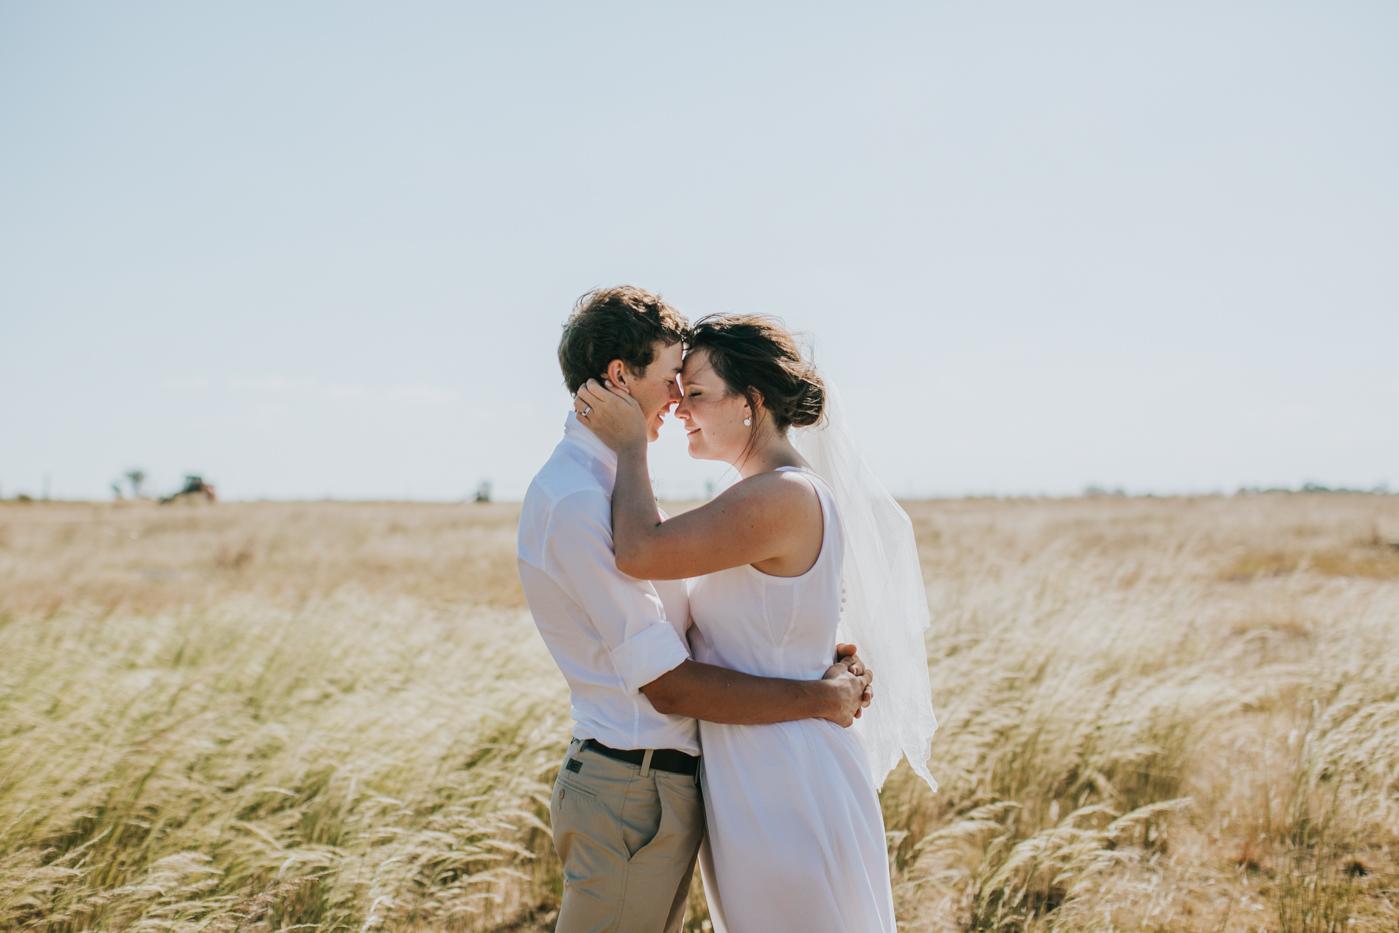 Nicolle & Jacob - Dubbo Wedding - Country Australia - Samantha Heather Photography-161.jpg